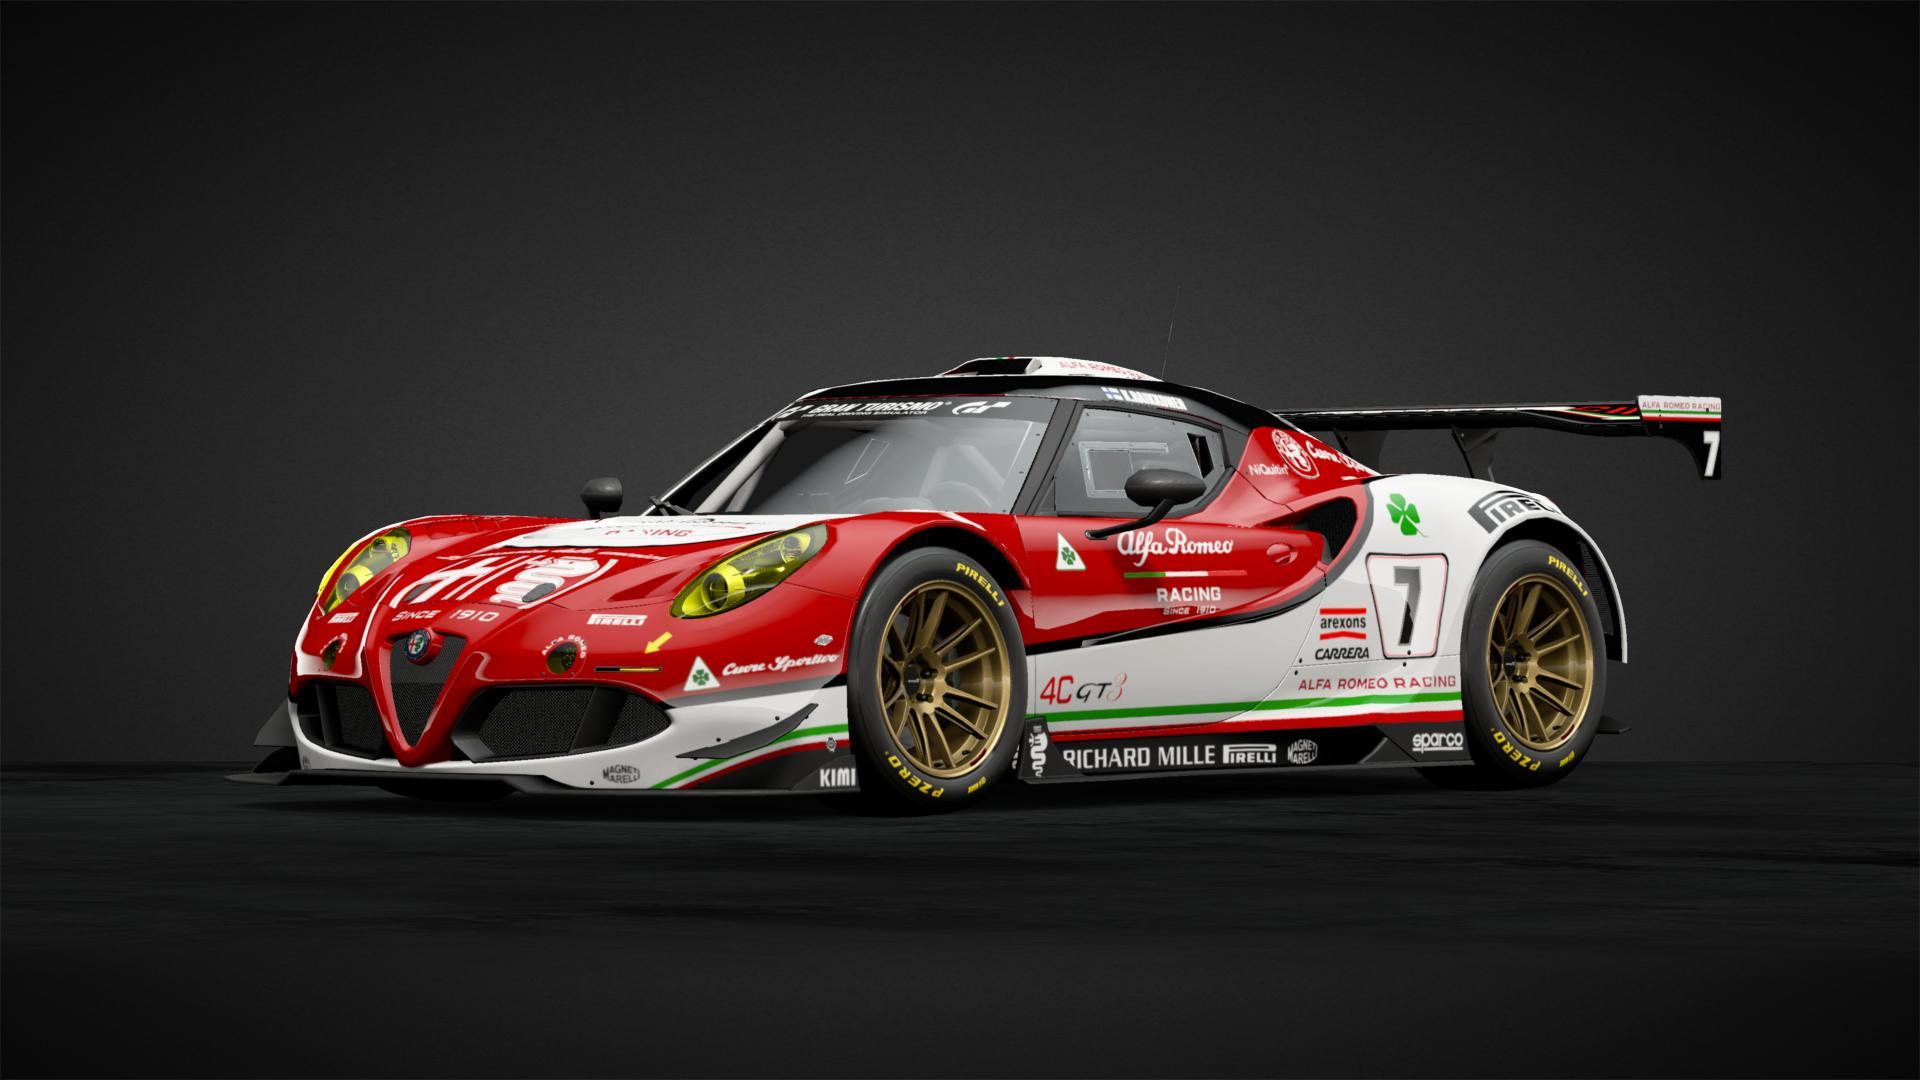 Alfa Romeo 4c Racing Car Livery By Super Italia 10 Community Gran Turismo Sport